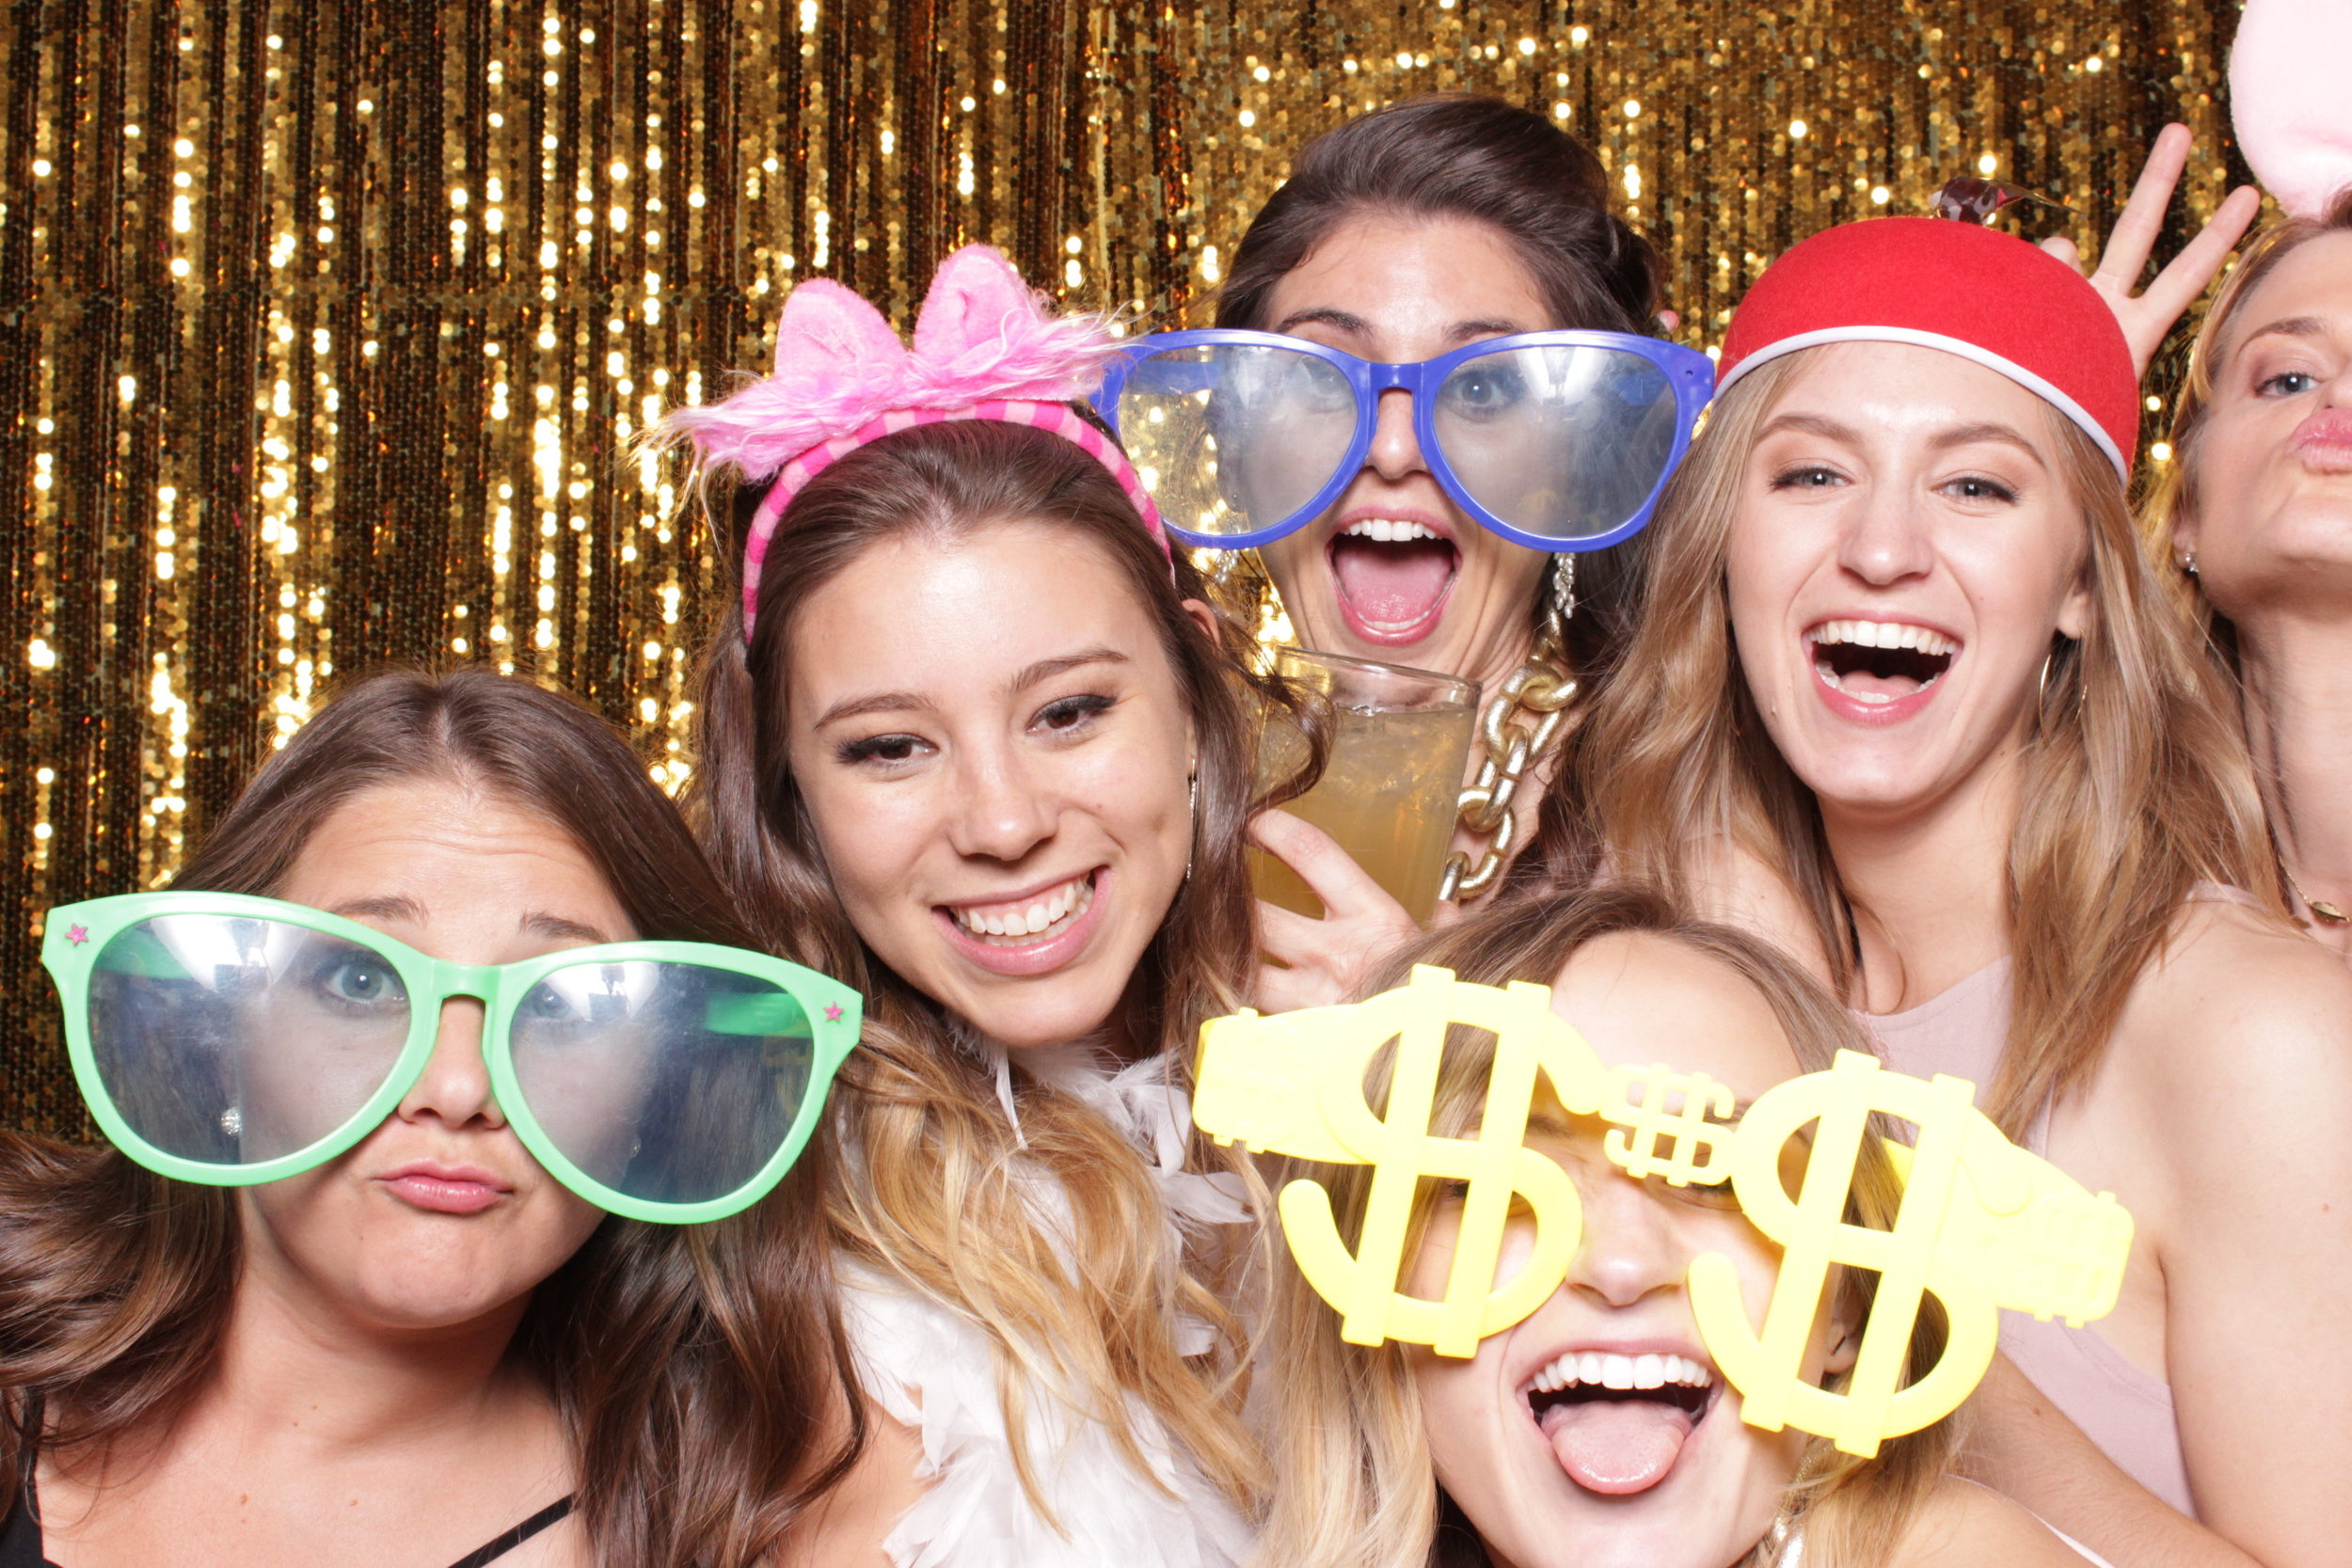 chico-wedding-photo-booth-rental-trebooth-fun